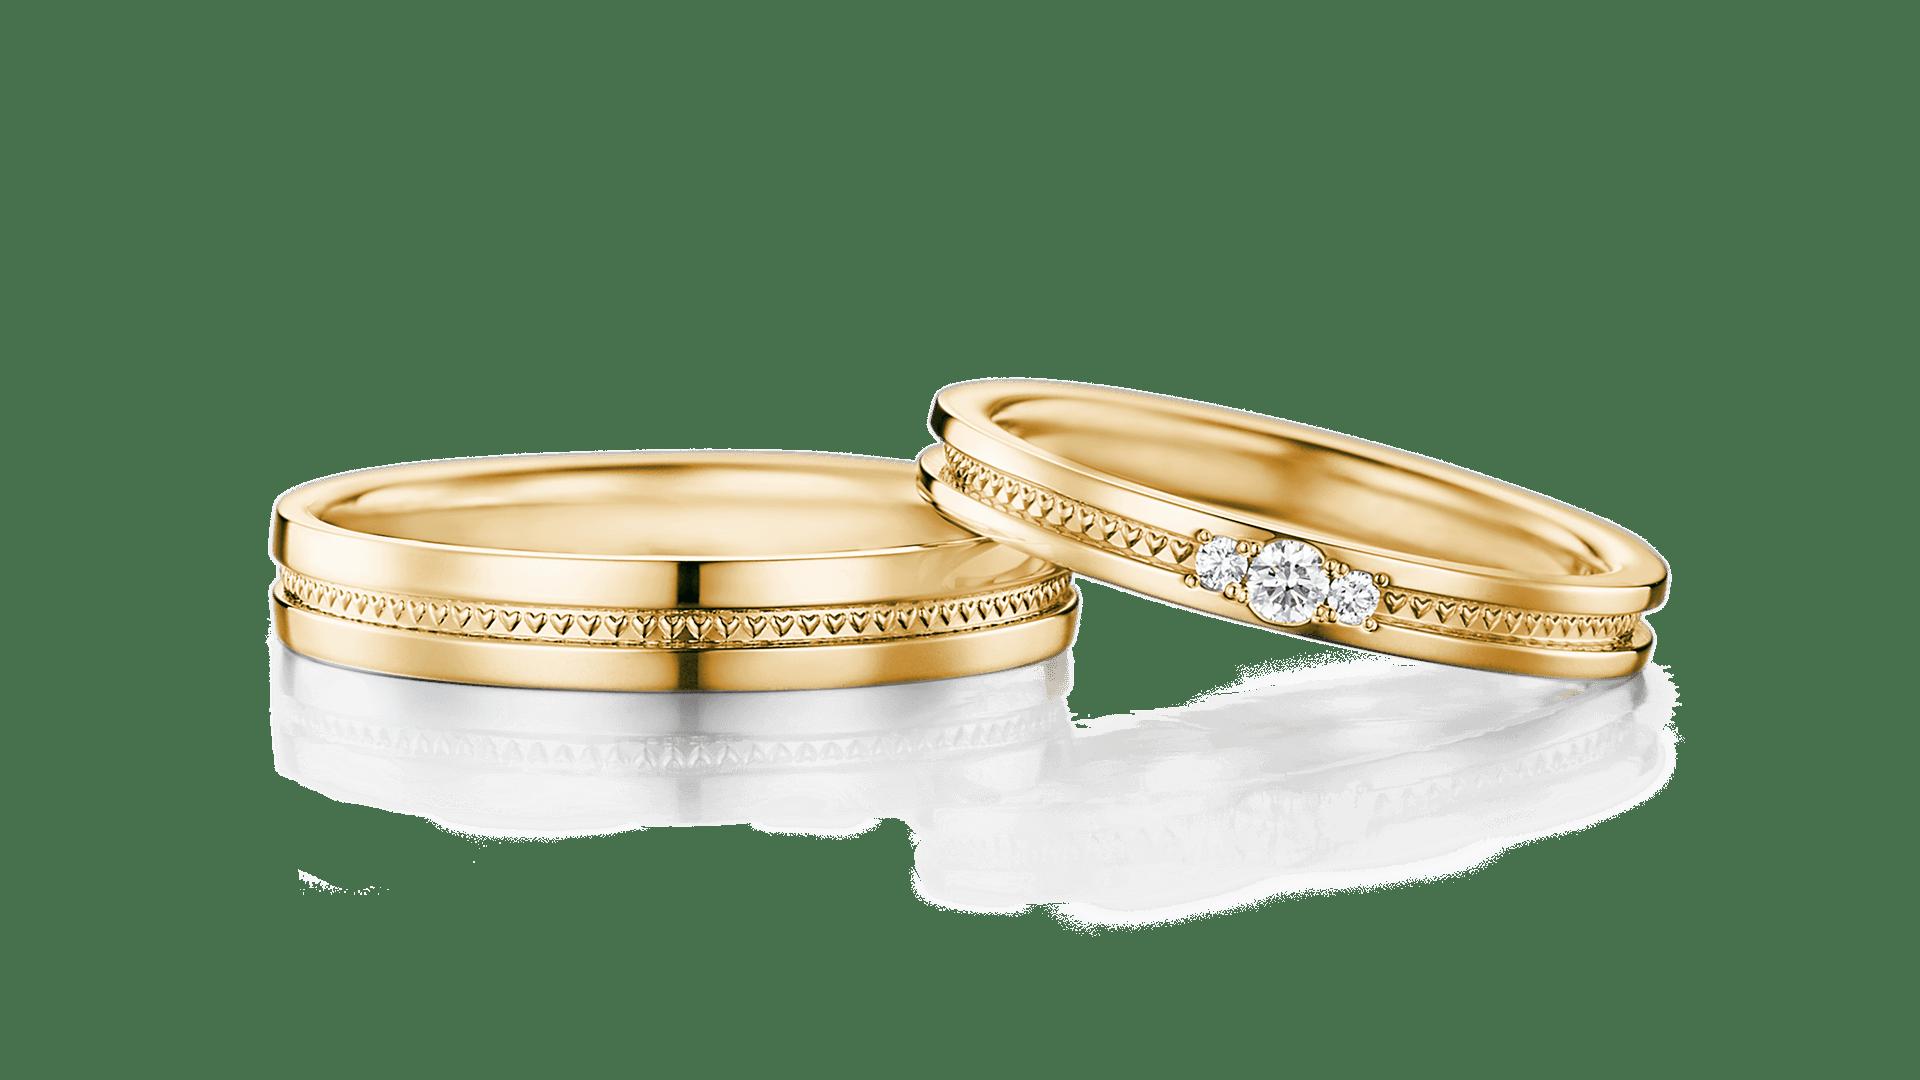 dione ディオーネ   結婚指輪サムネイル 1